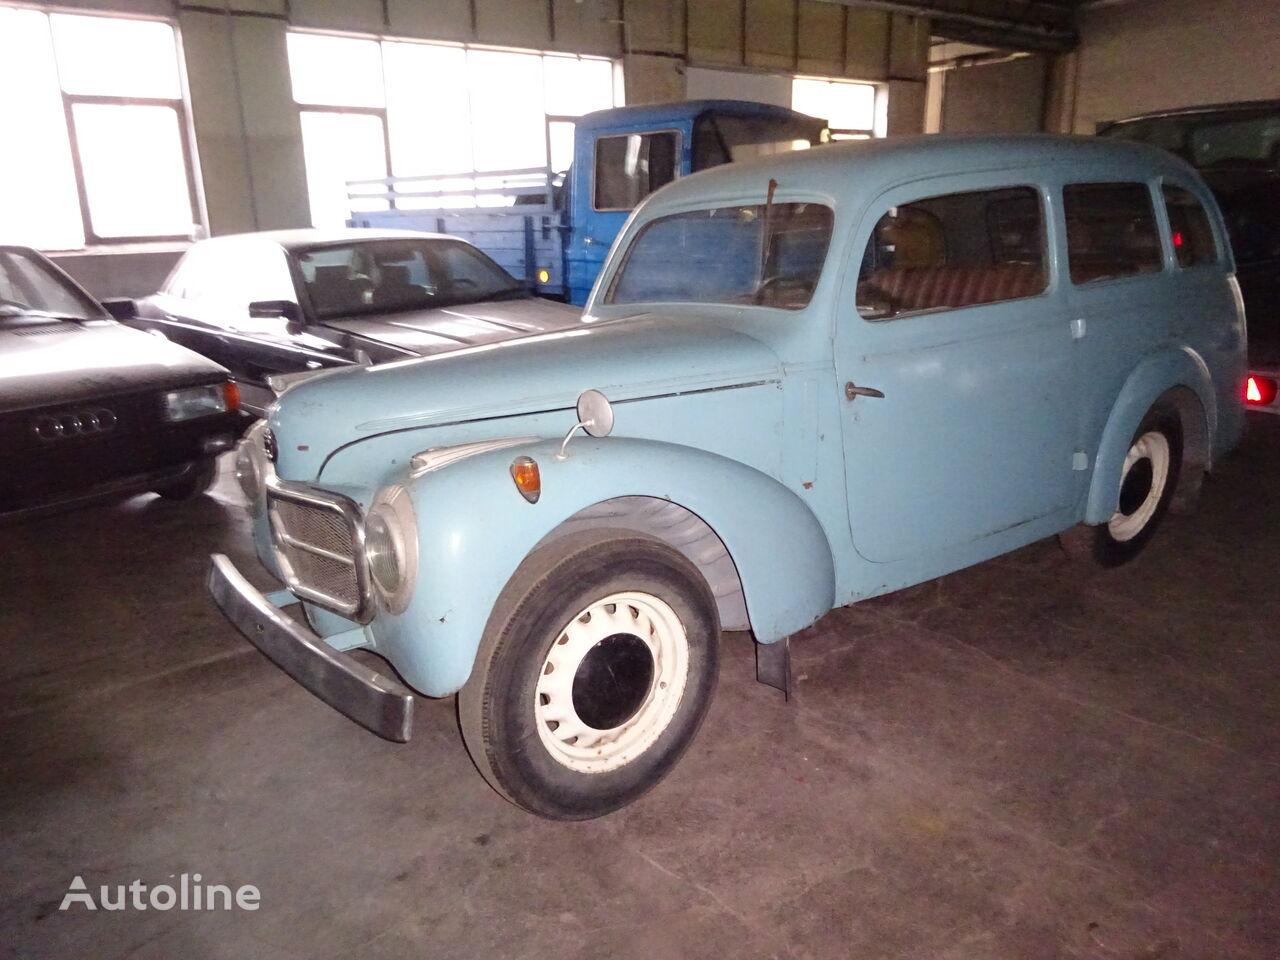 SKODA 1102 -1951 Tudor STW estate car